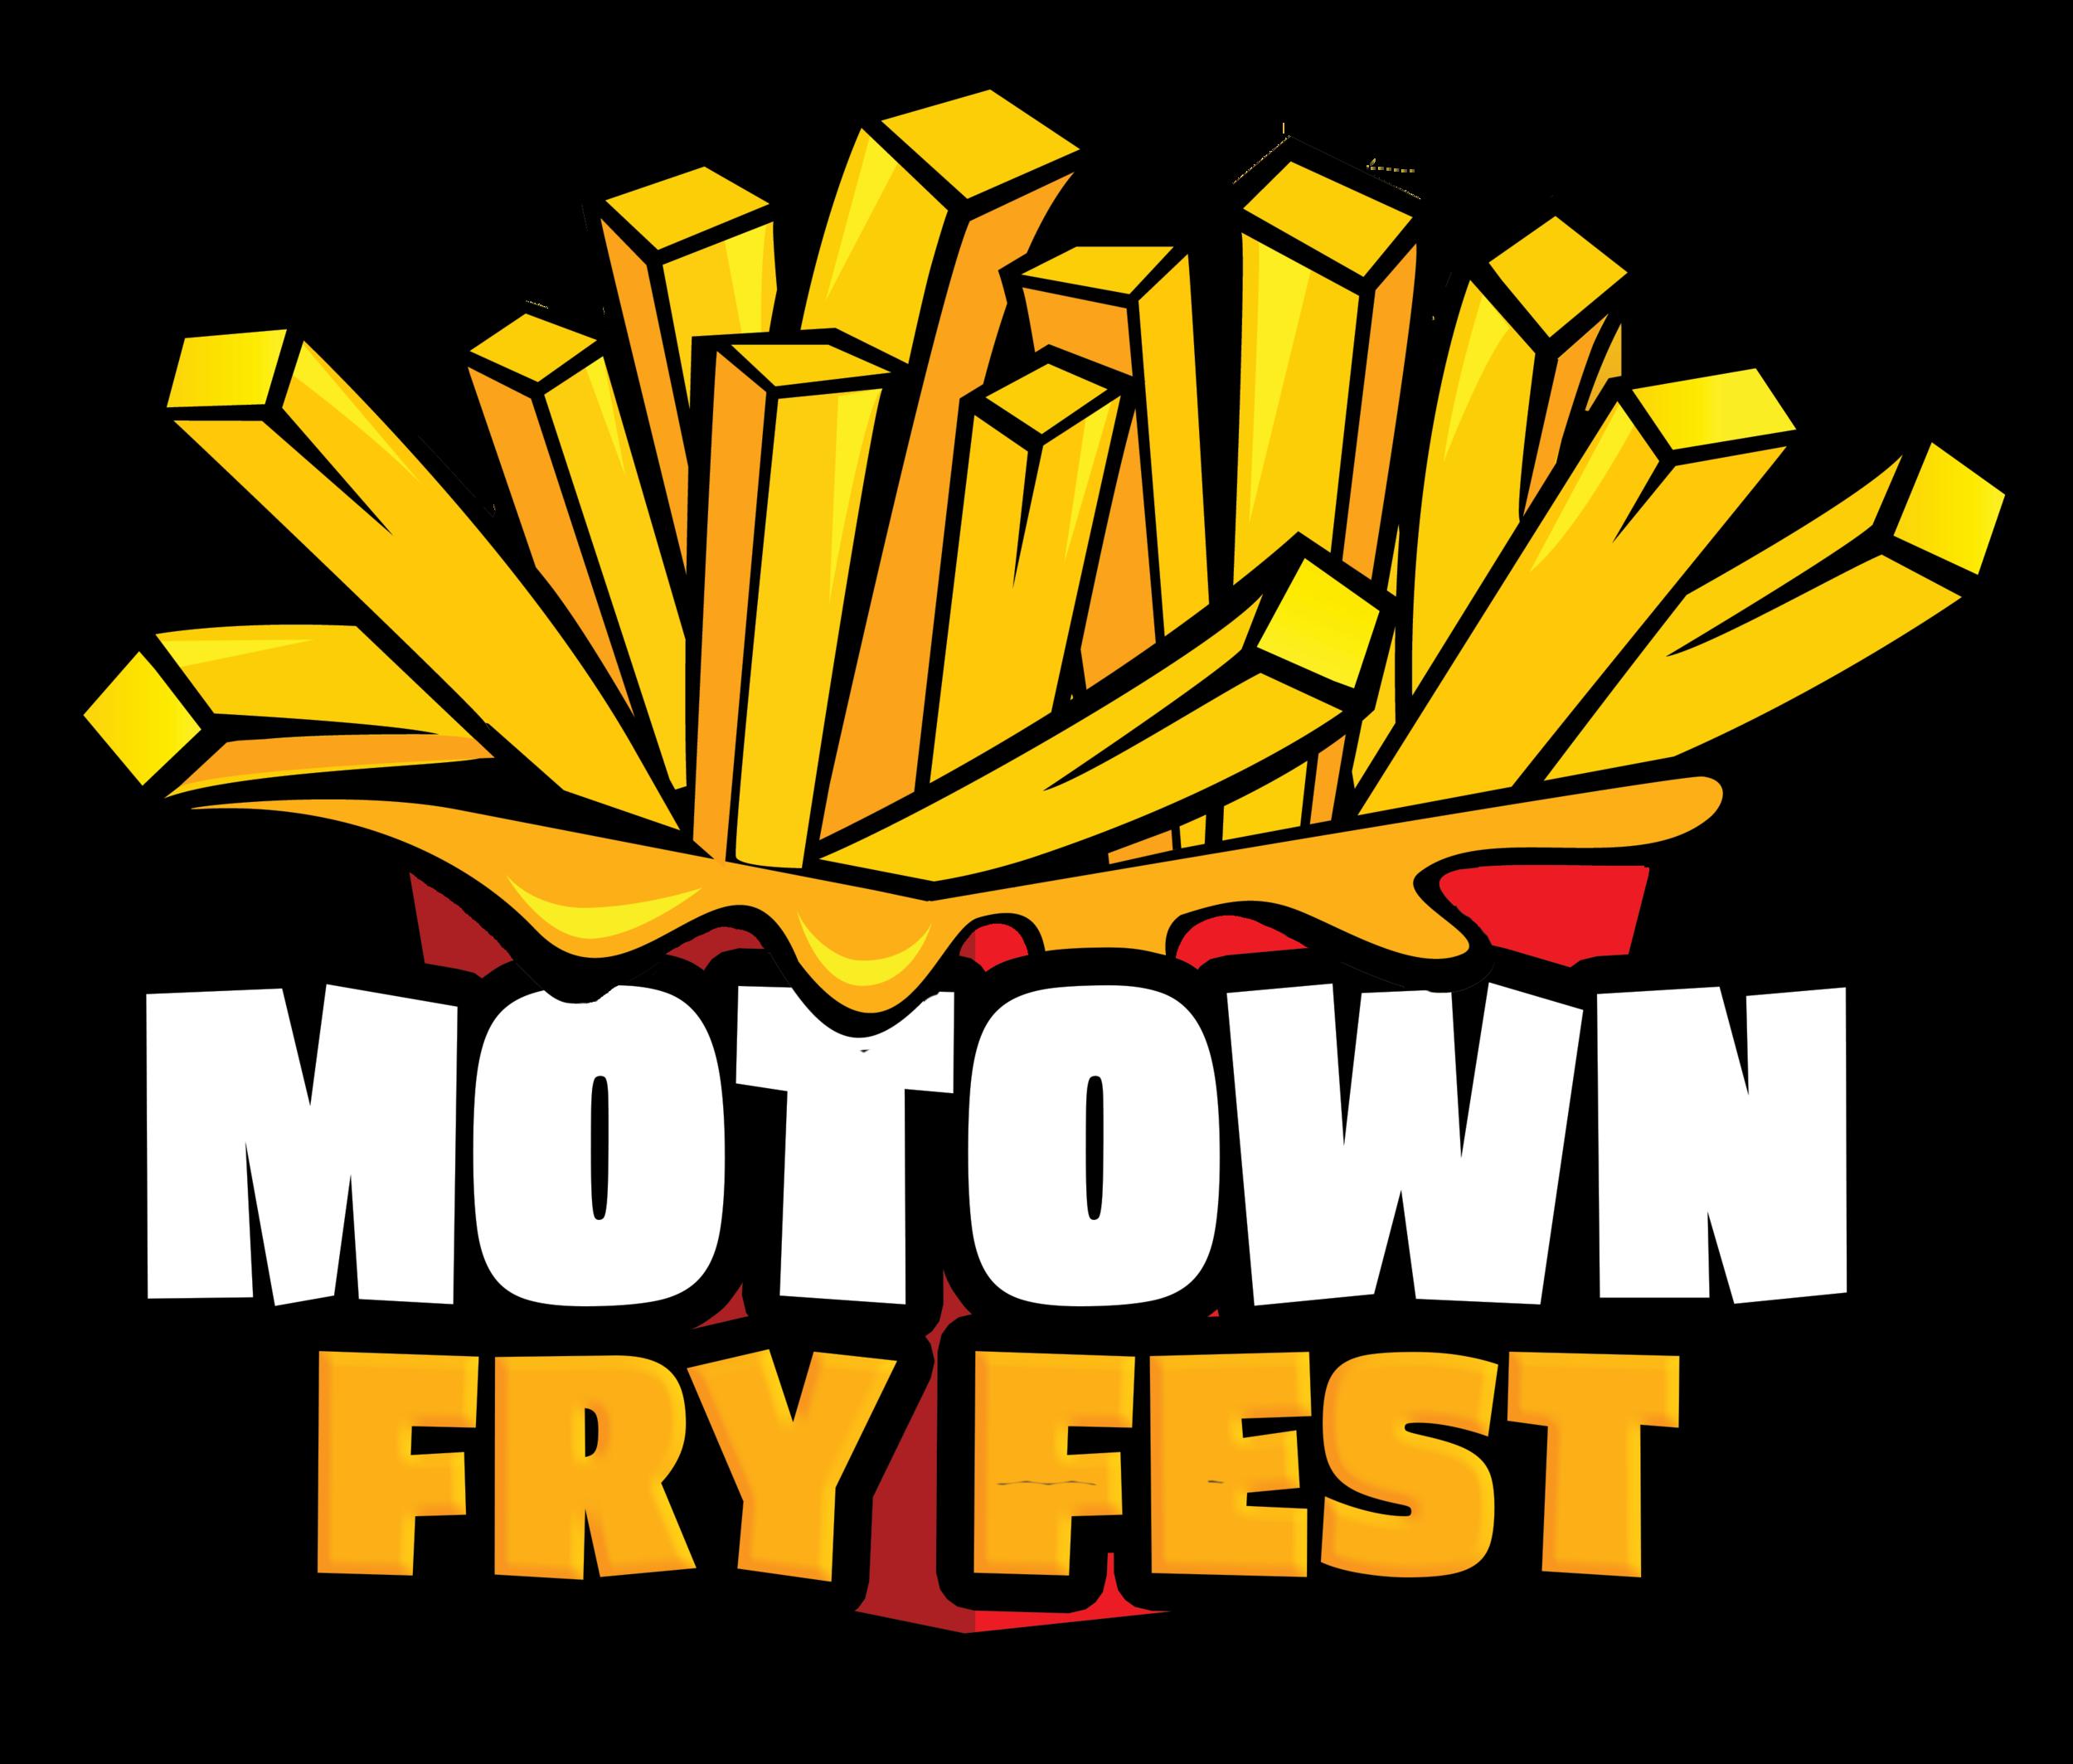 MOTOWN FRY FEST.png